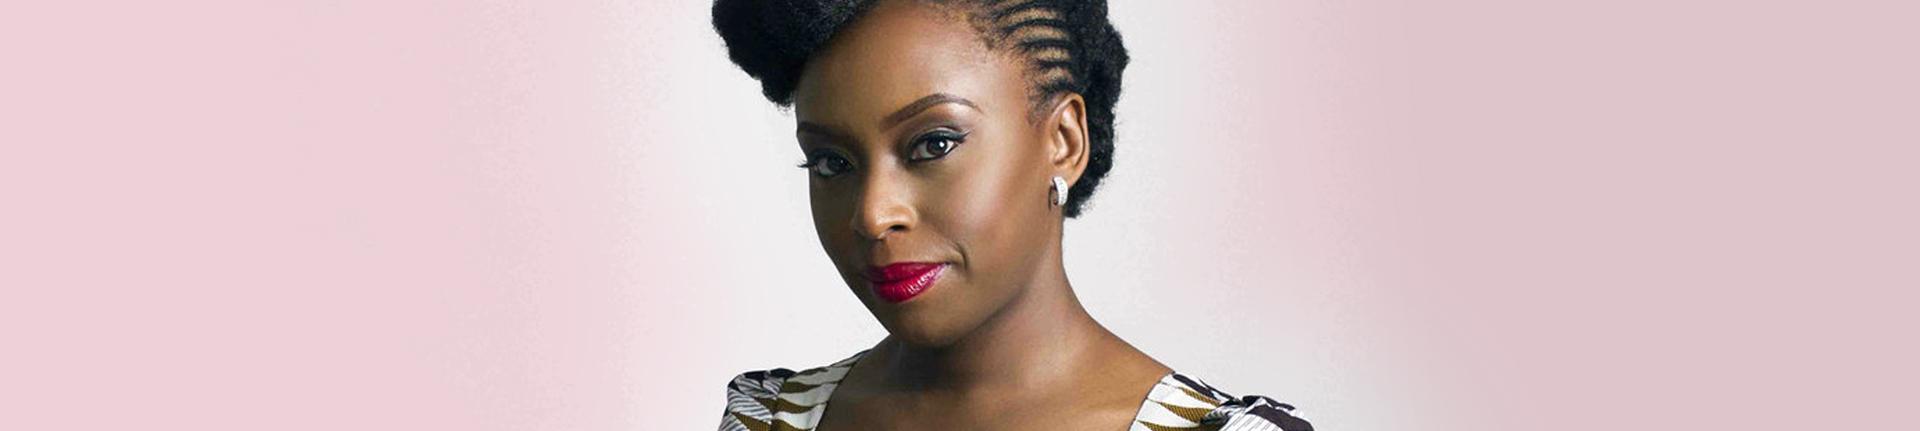 Literatura e liberdade: Chimamanda Ngozi Adichie